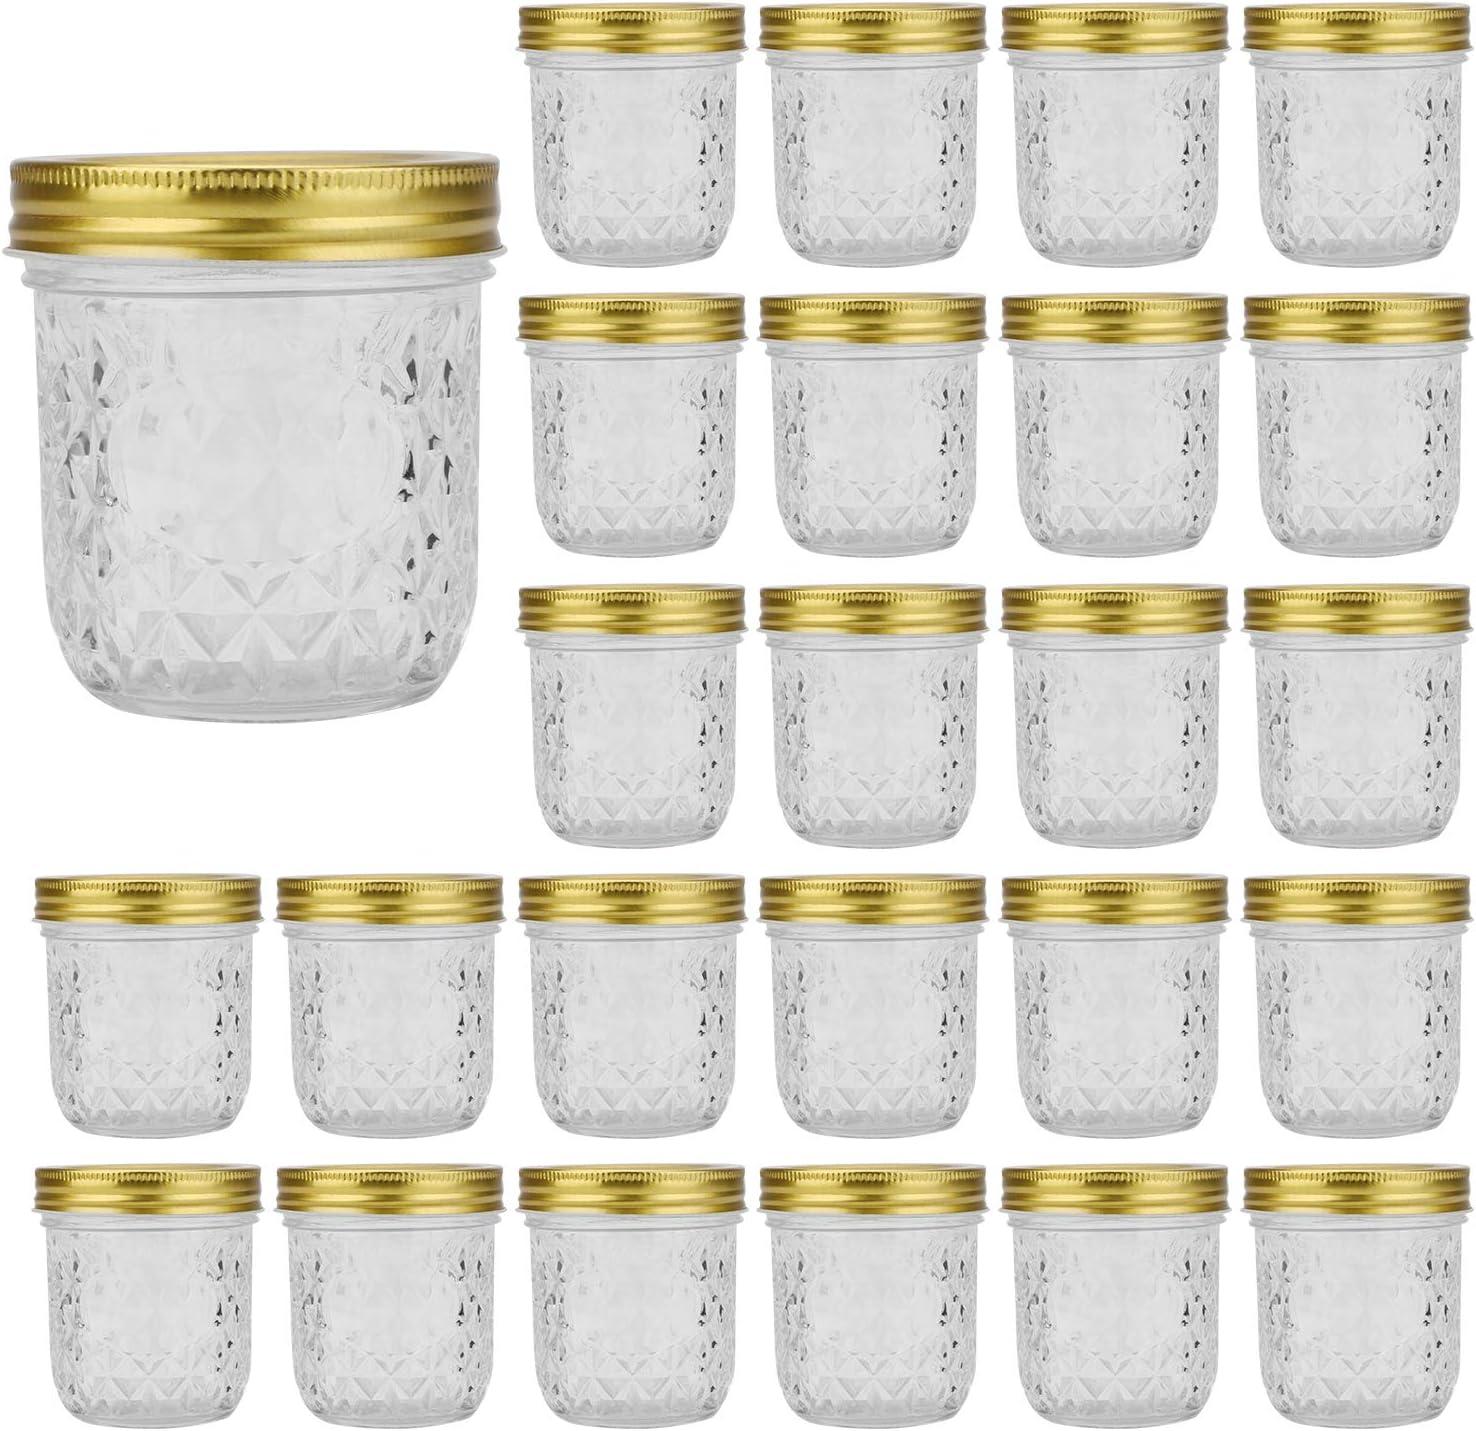 Glass Jars With Lids 8 oz,Encheng Regular Mouth Mason Jars 250ml,Small Canning Jars For Caviar,Herb,Jelly,Jams,Honey,Food Storage Jars Dishware Safe,Set Of 24 …